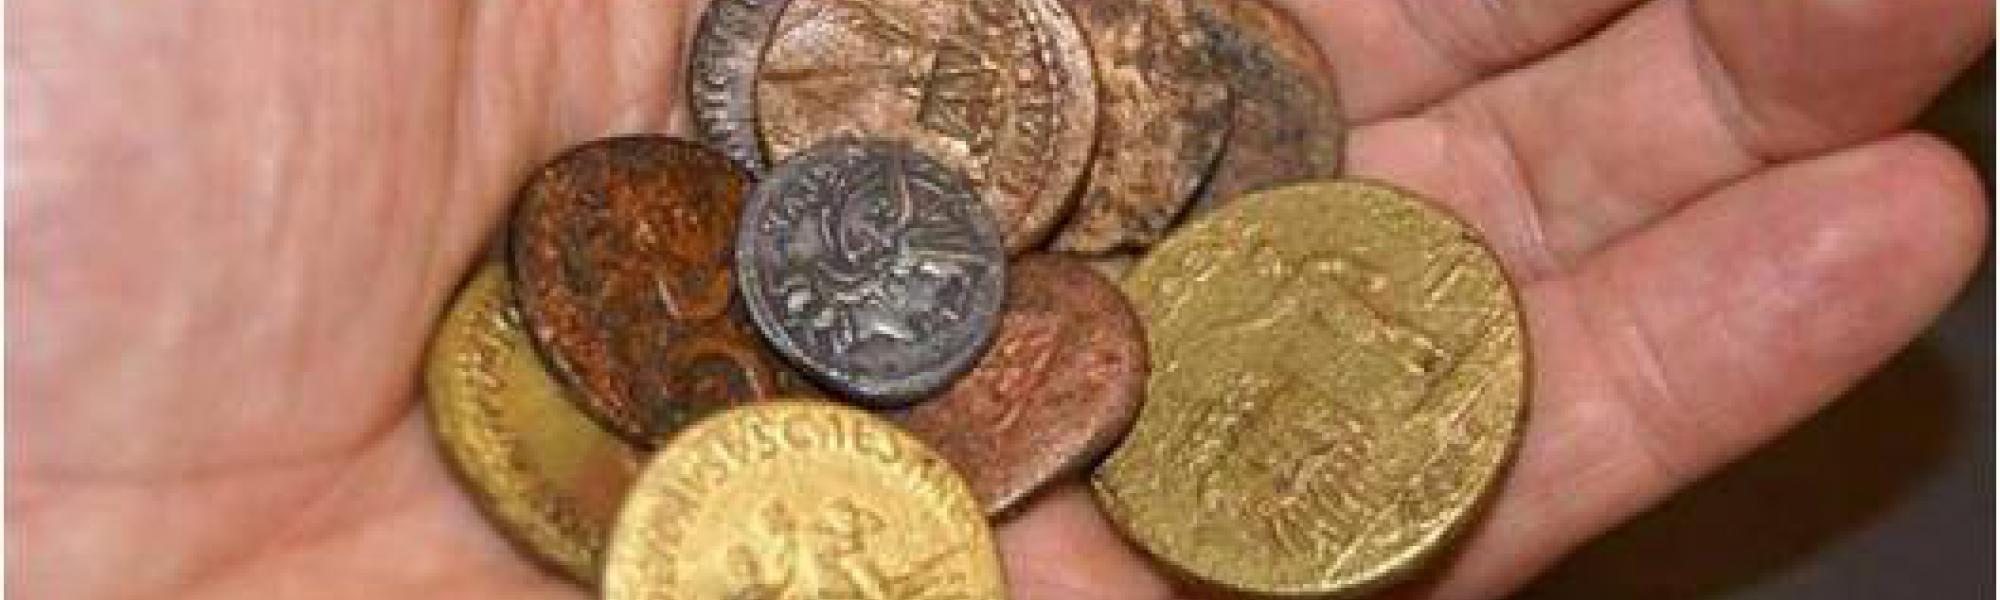 Handvol Romeinse munten